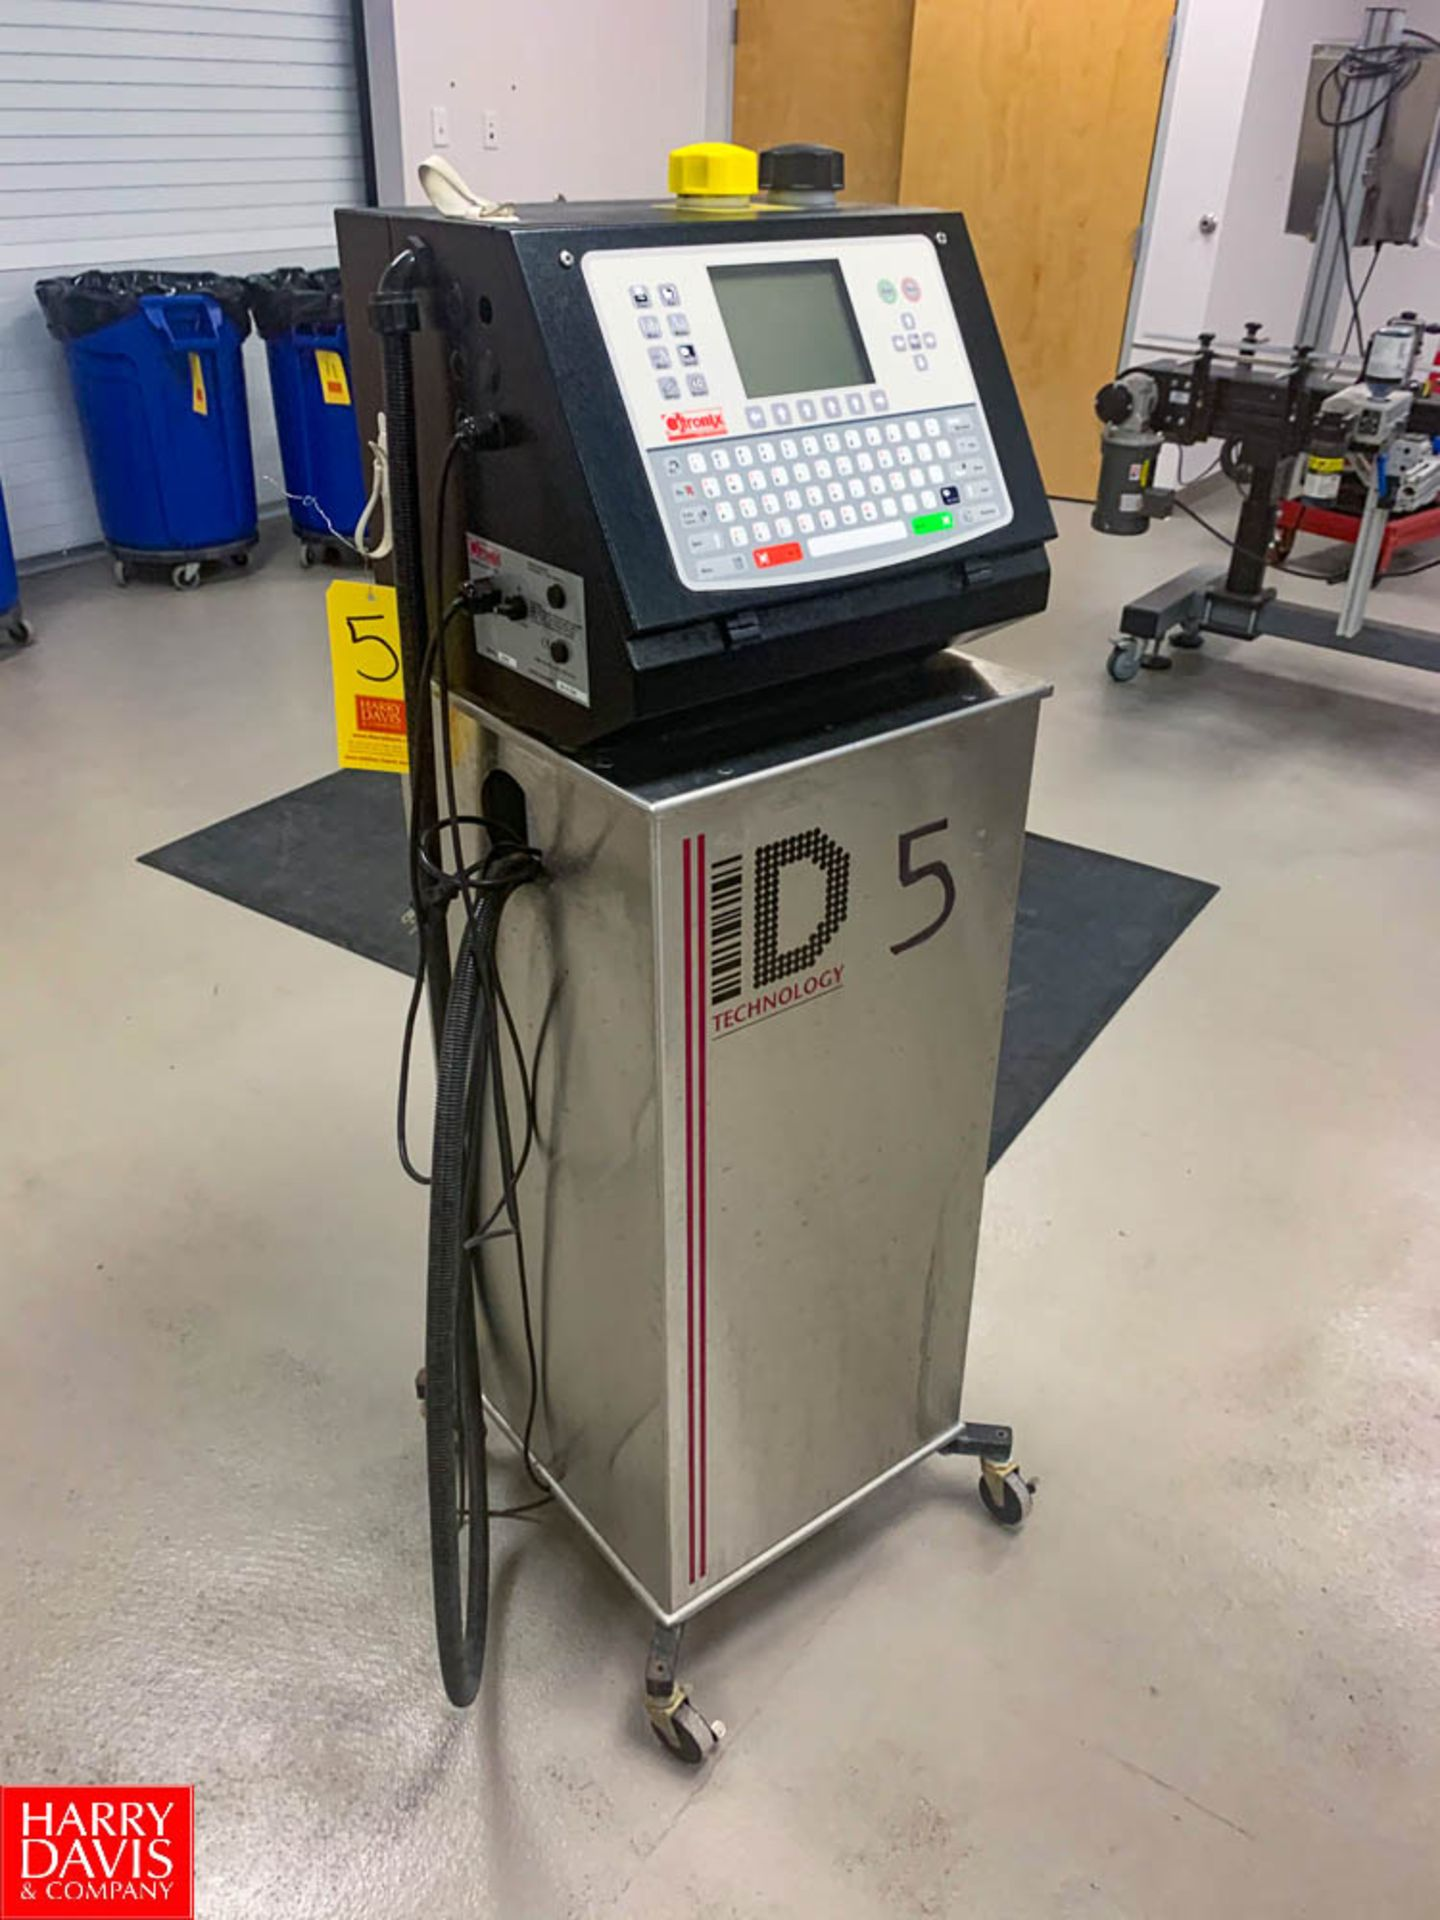 Citronix ID Technology Ink Jet Printer S/N: 0414134B Model: ci580 Rigging: $50